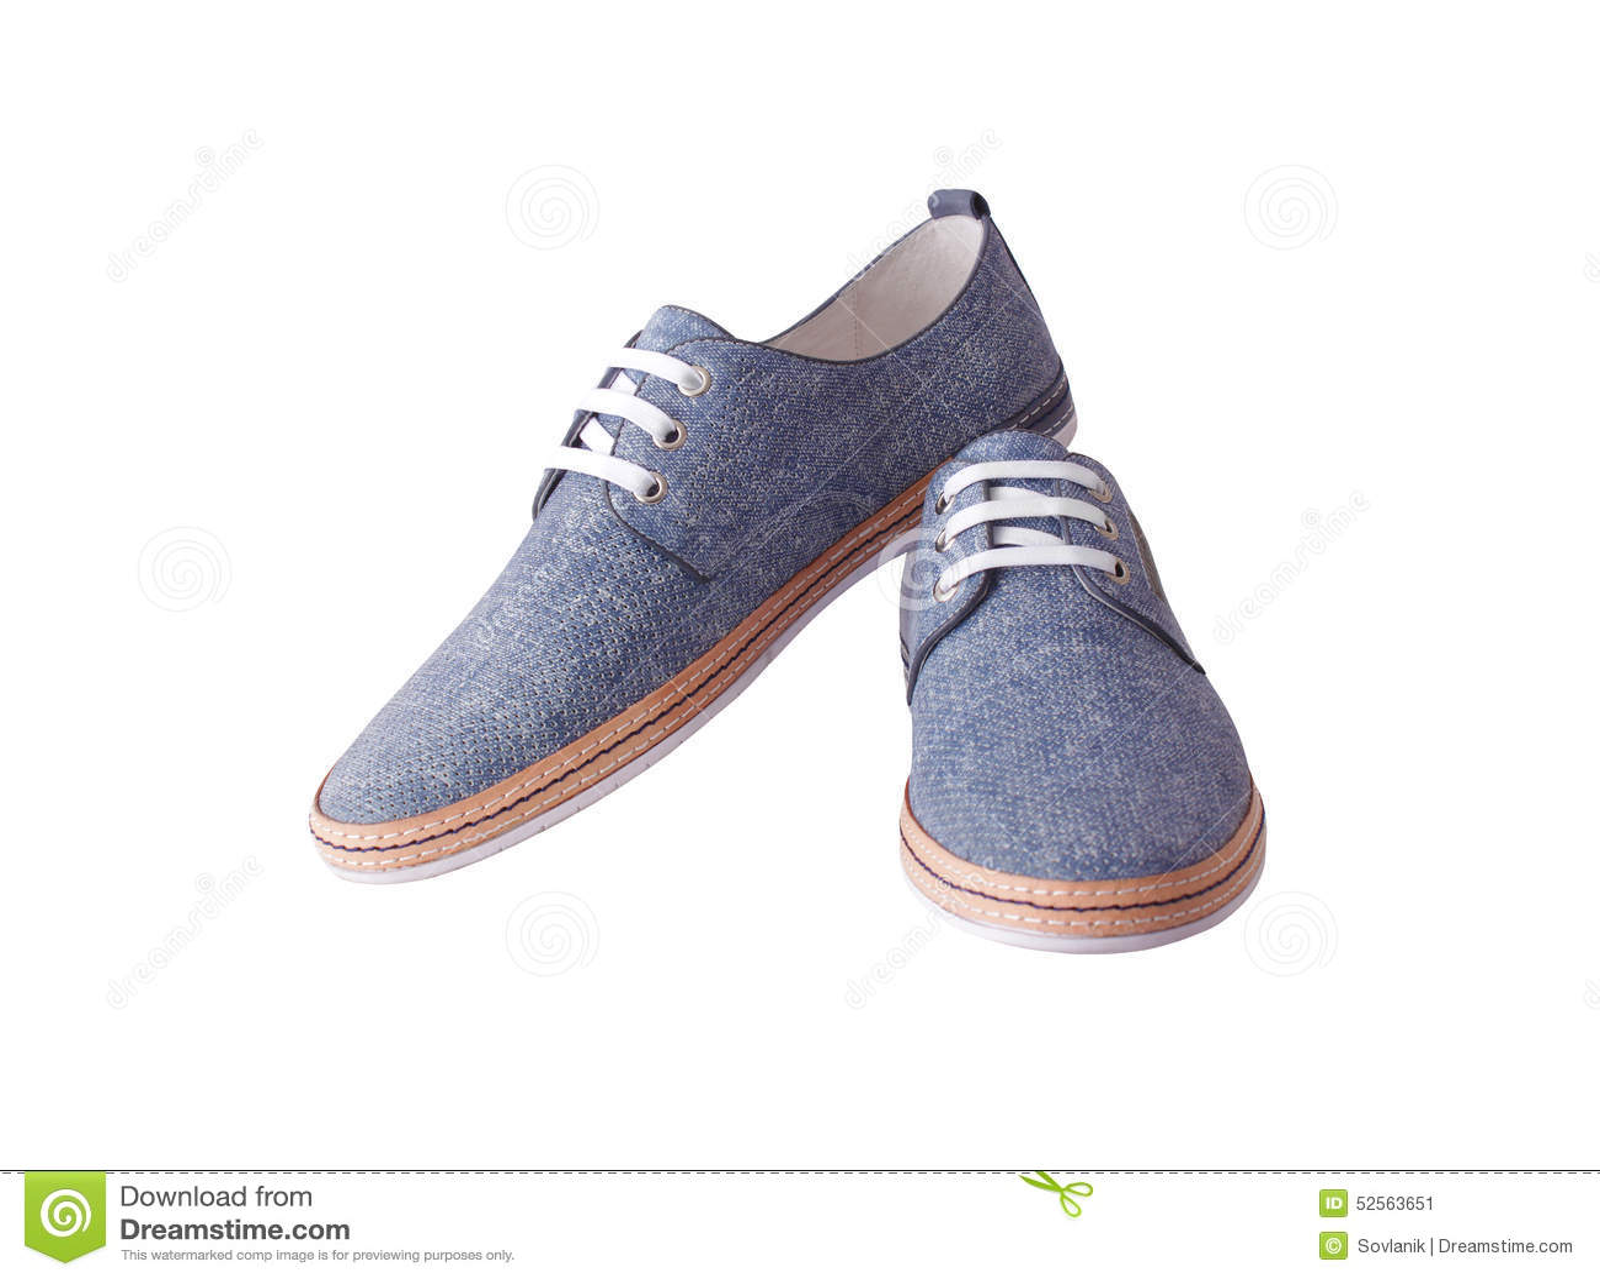 1a3e8d24f Zapatos Para Un Hombre Joven Imagen de archivo - Imagen de hombre ...